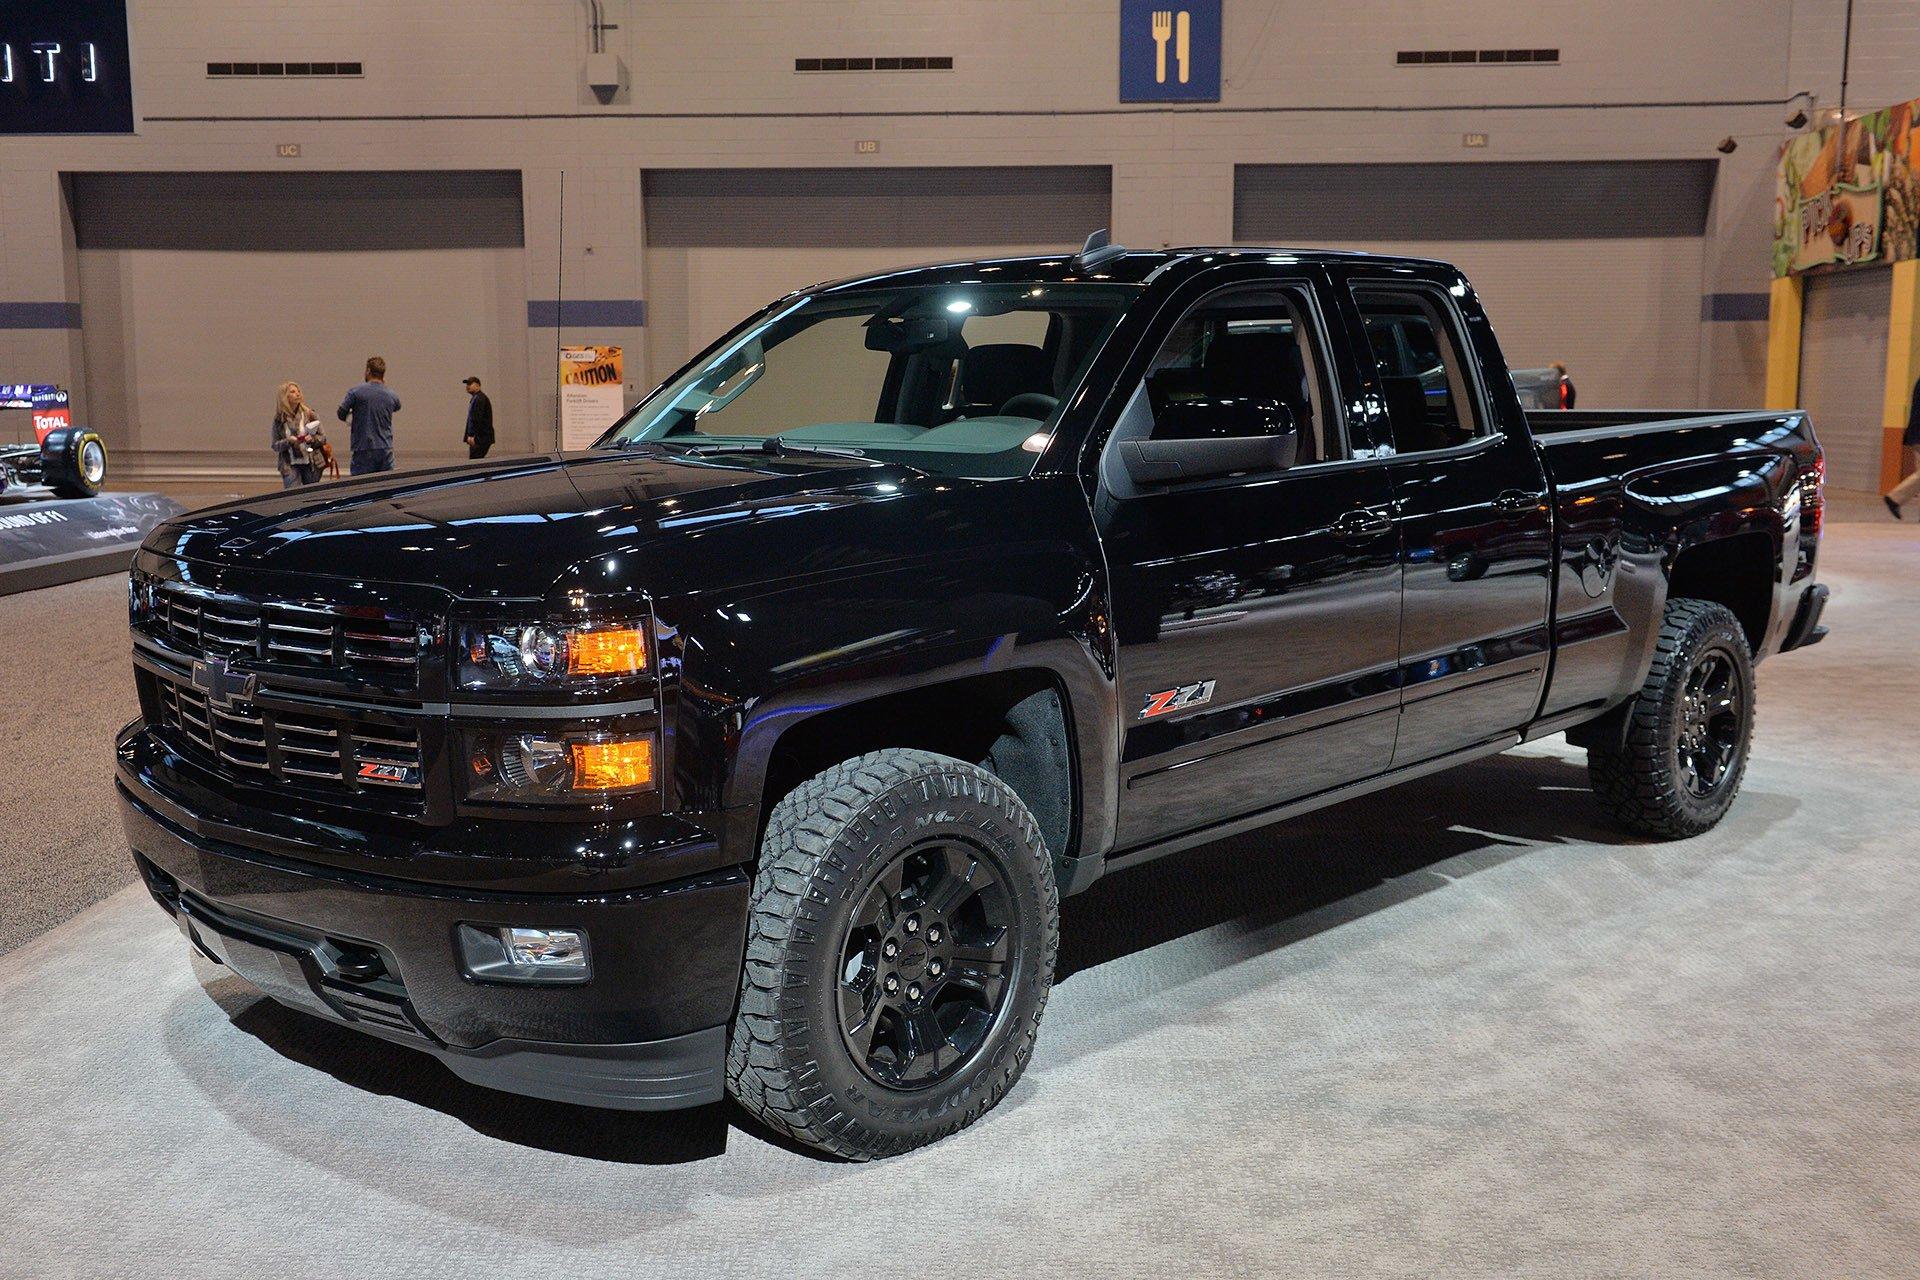 2015 Chevy Silverado Midnight Edition cars truck wallpaper ...